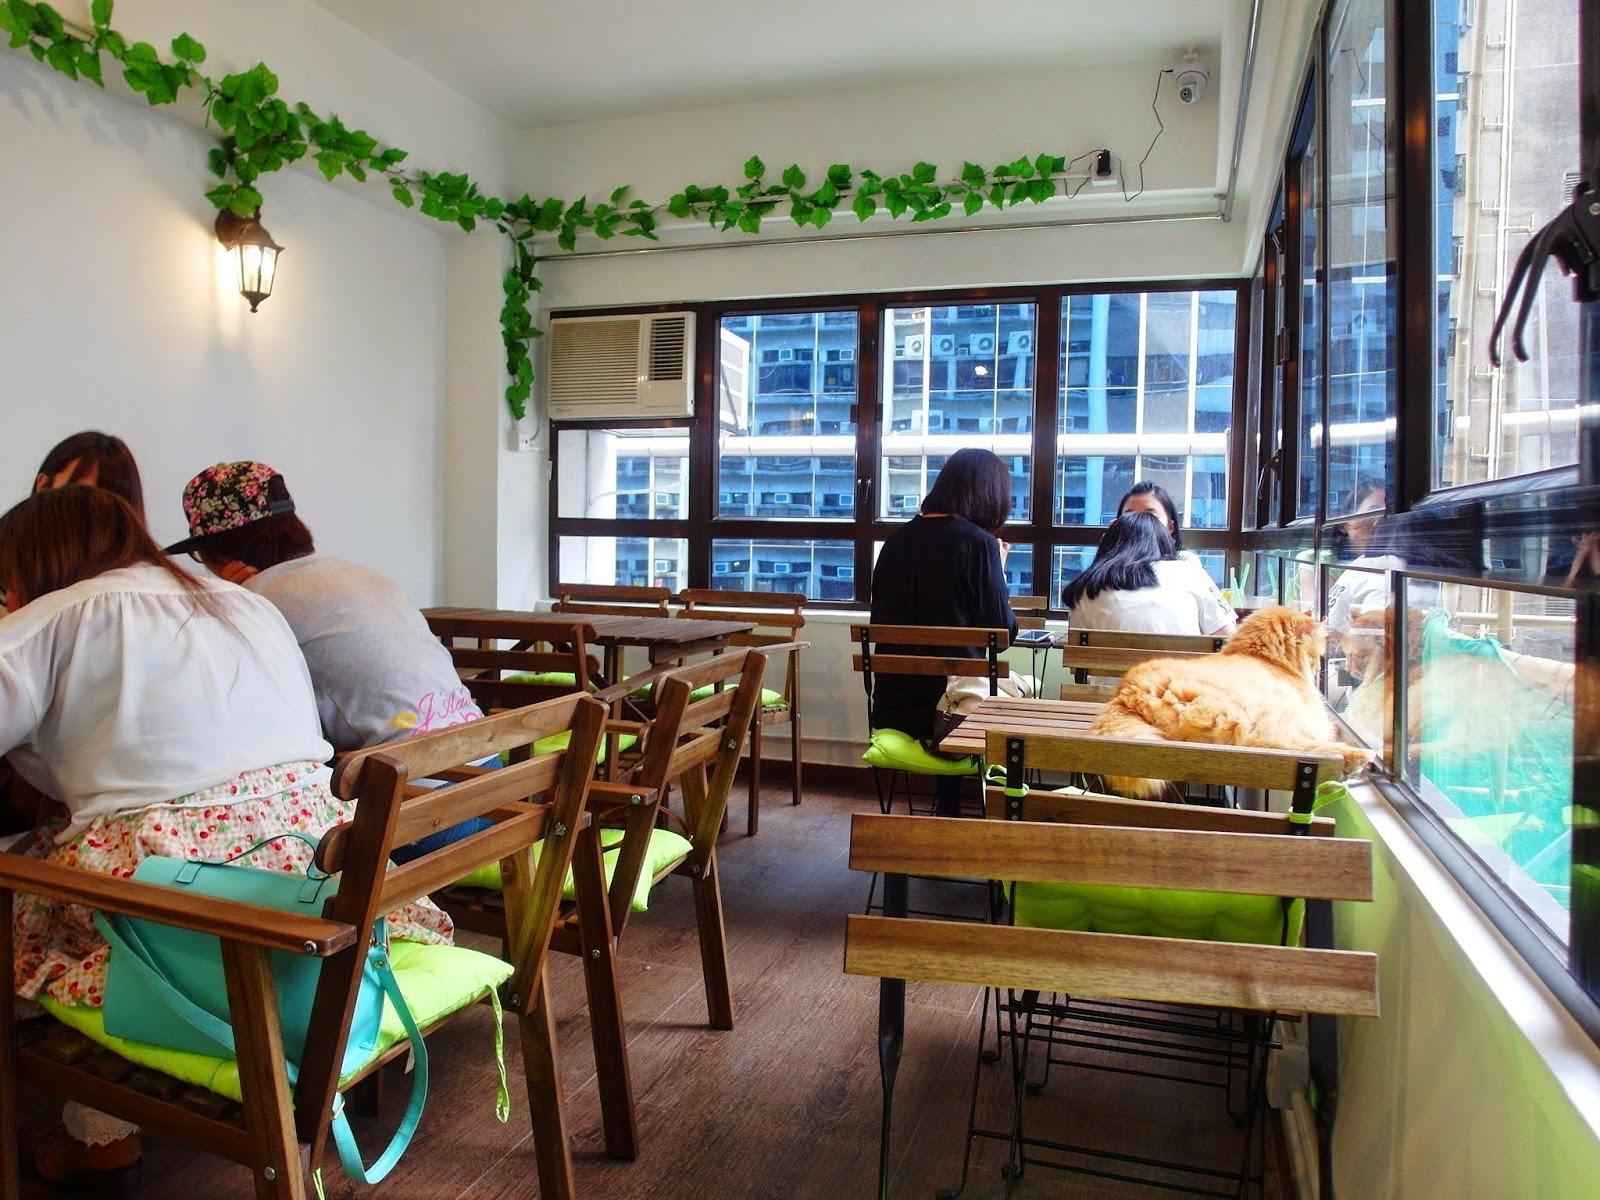 Cafe de Kitten